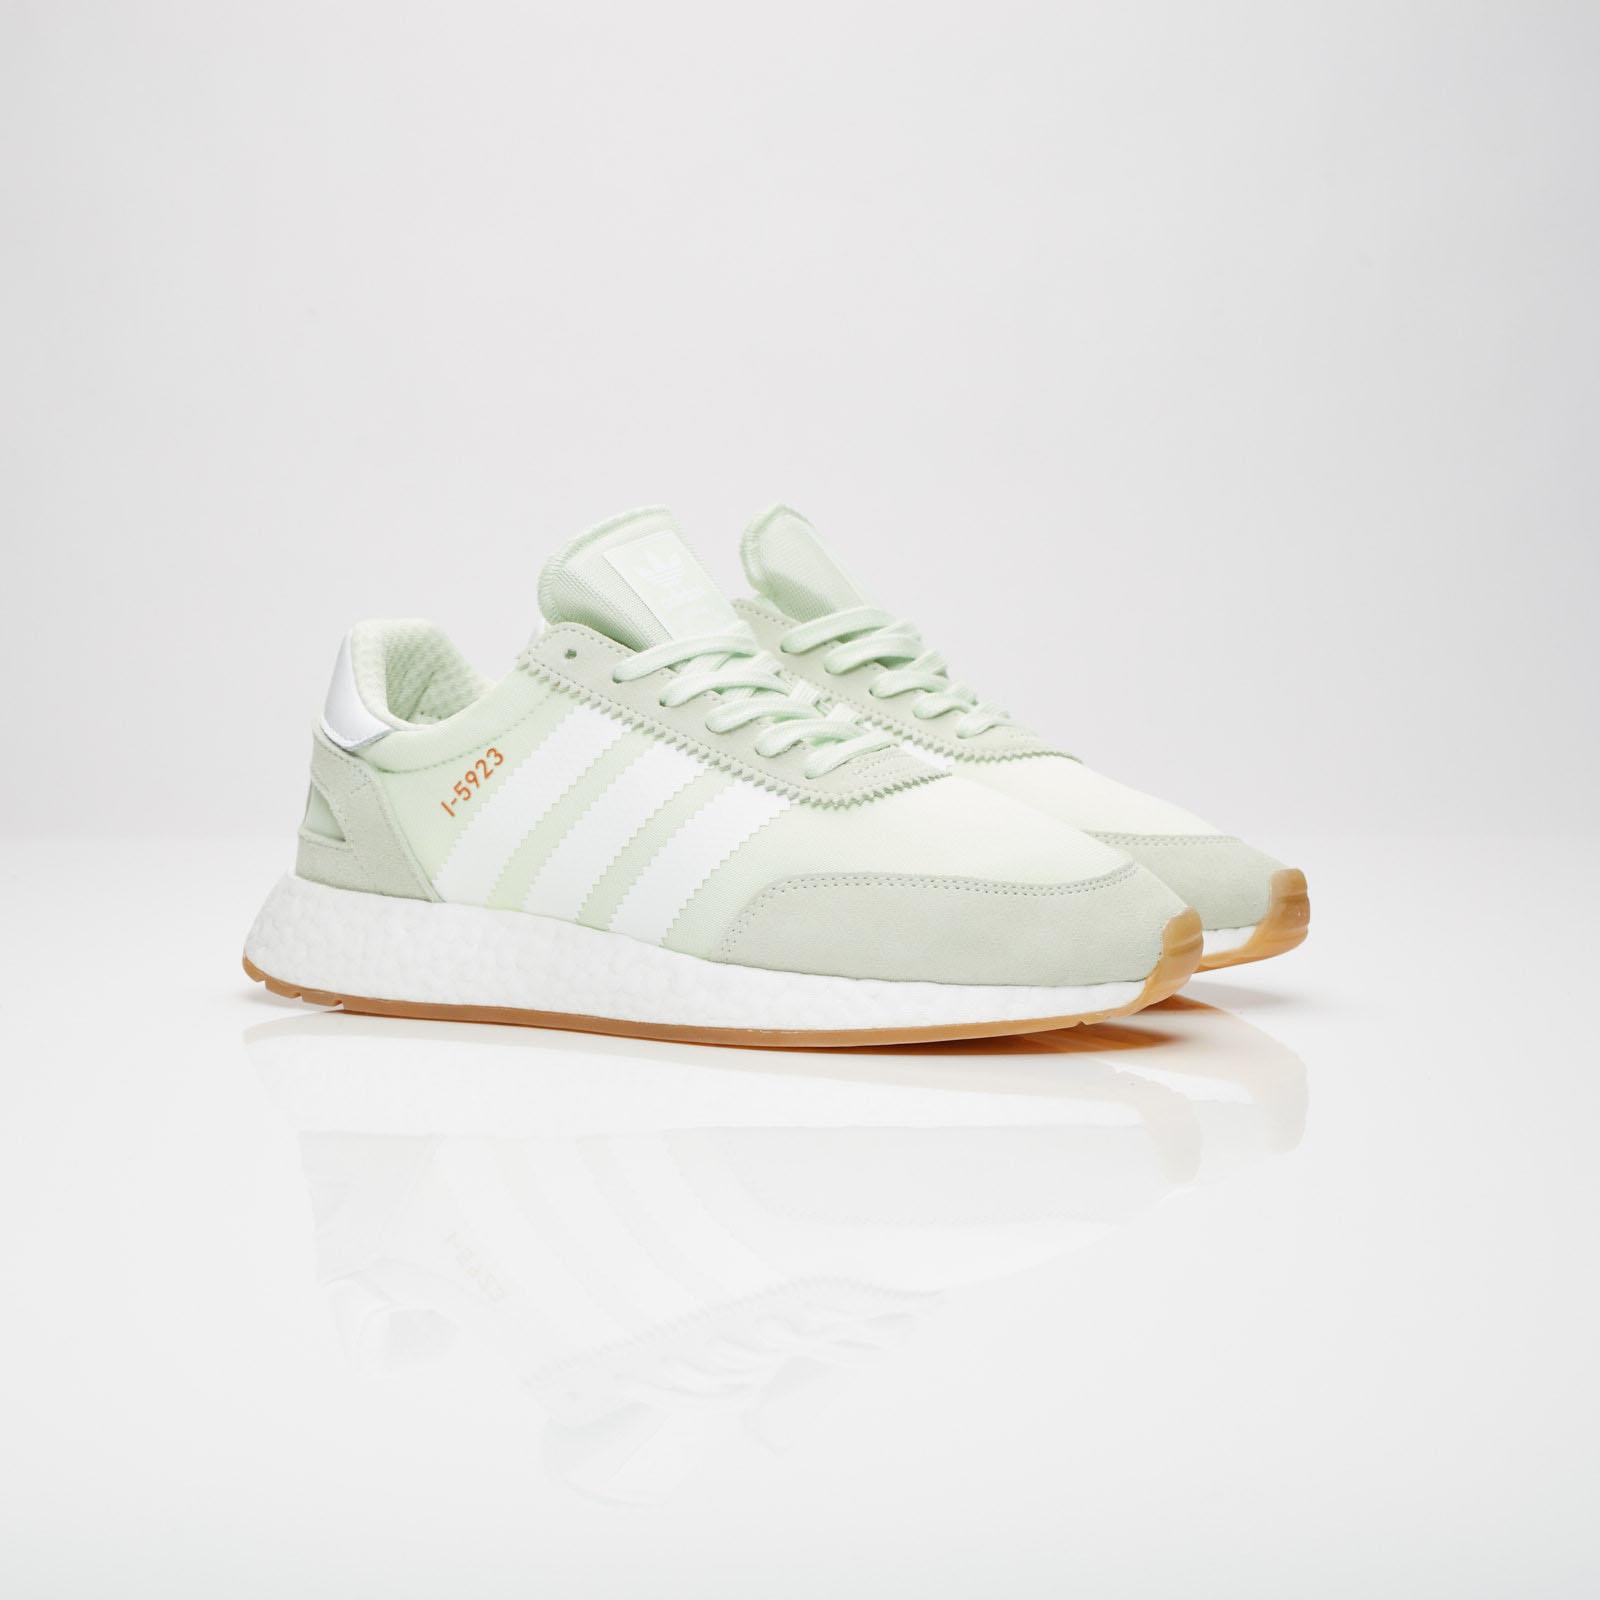 ebad83a8f8c adidas I-5923 - Cq2530 - Sneakersnstuff